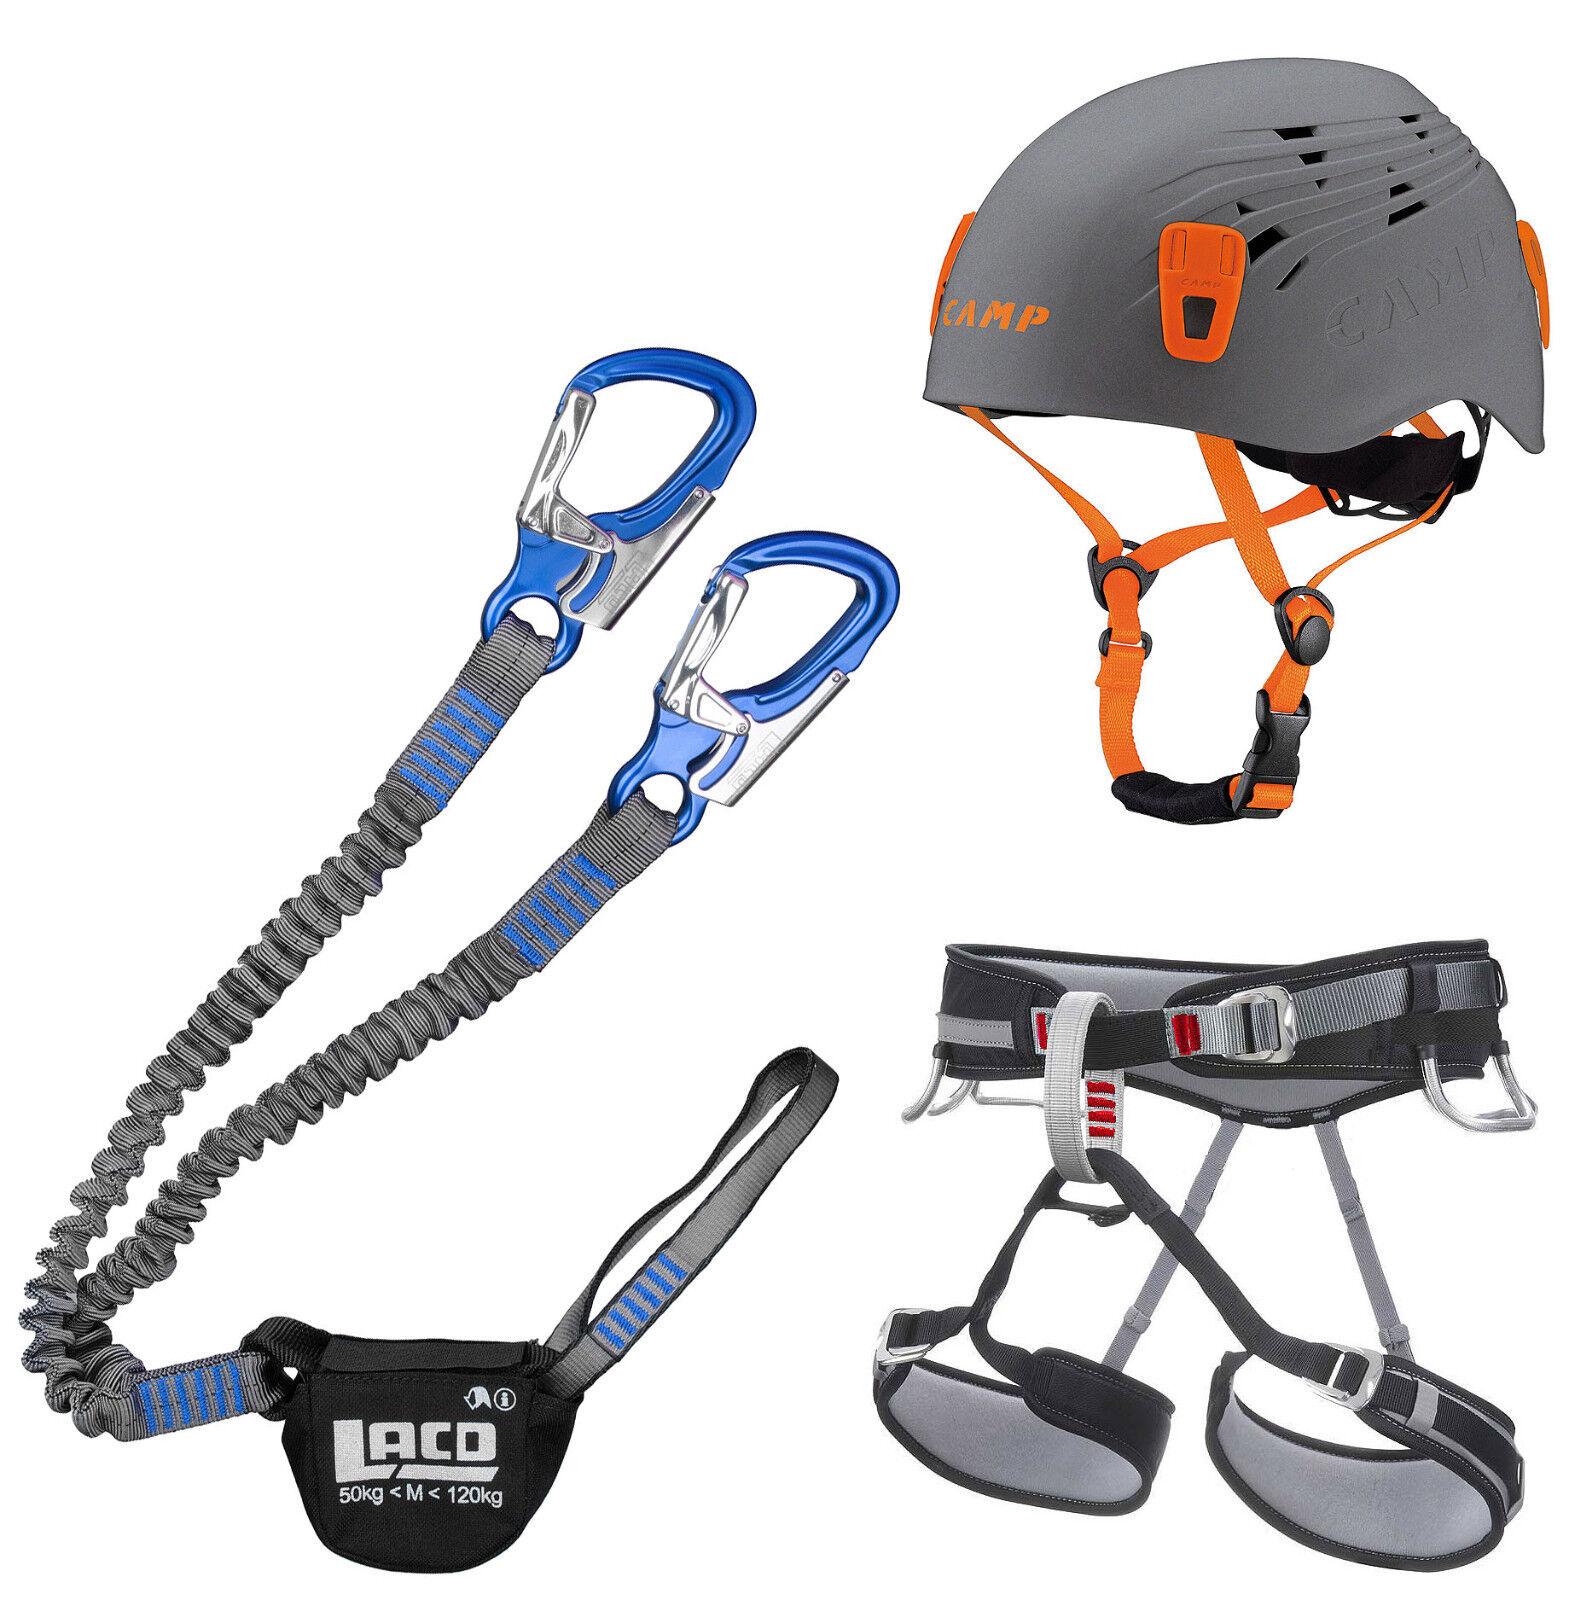 Klettersteigset LACD Pro Evo Blau + Gurt Start + + + Helm Camp Titan grau 54-62cm 6ea7db